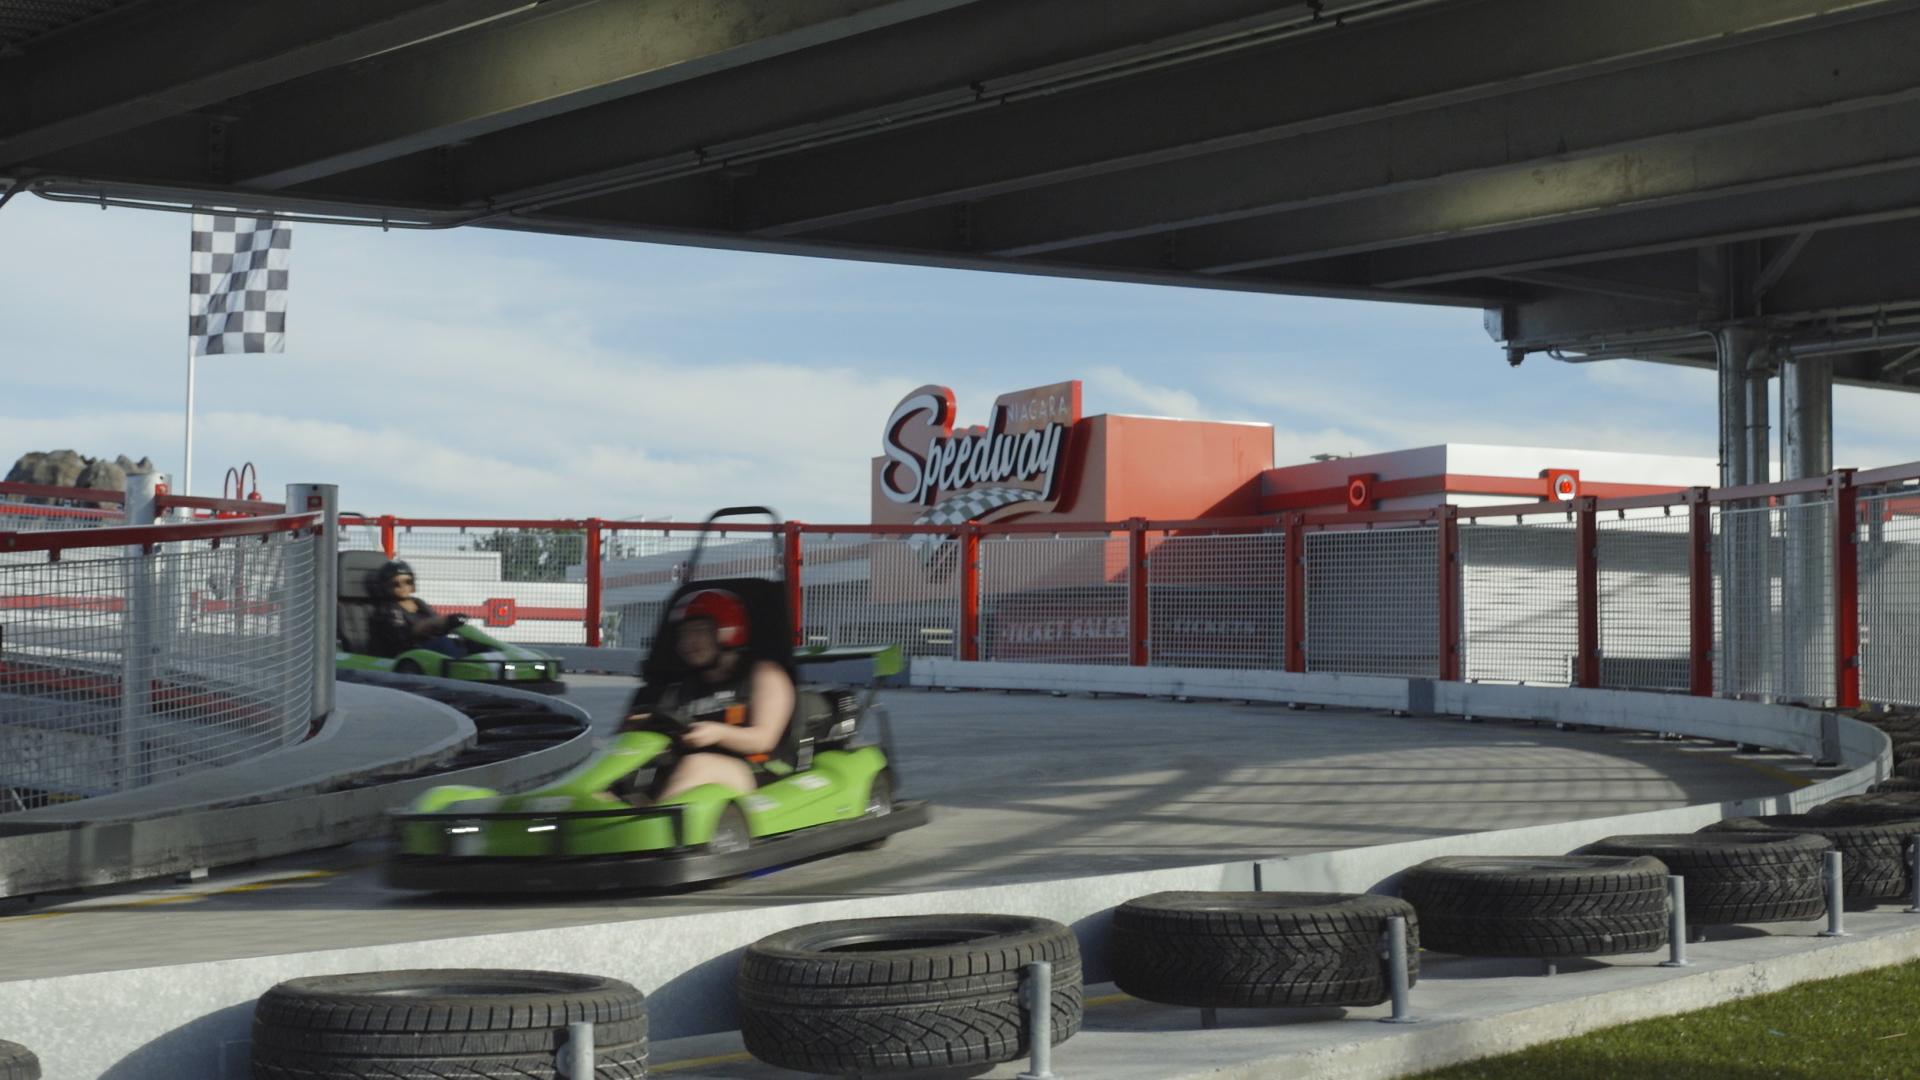 Niagara Speedway in Niagara Falls